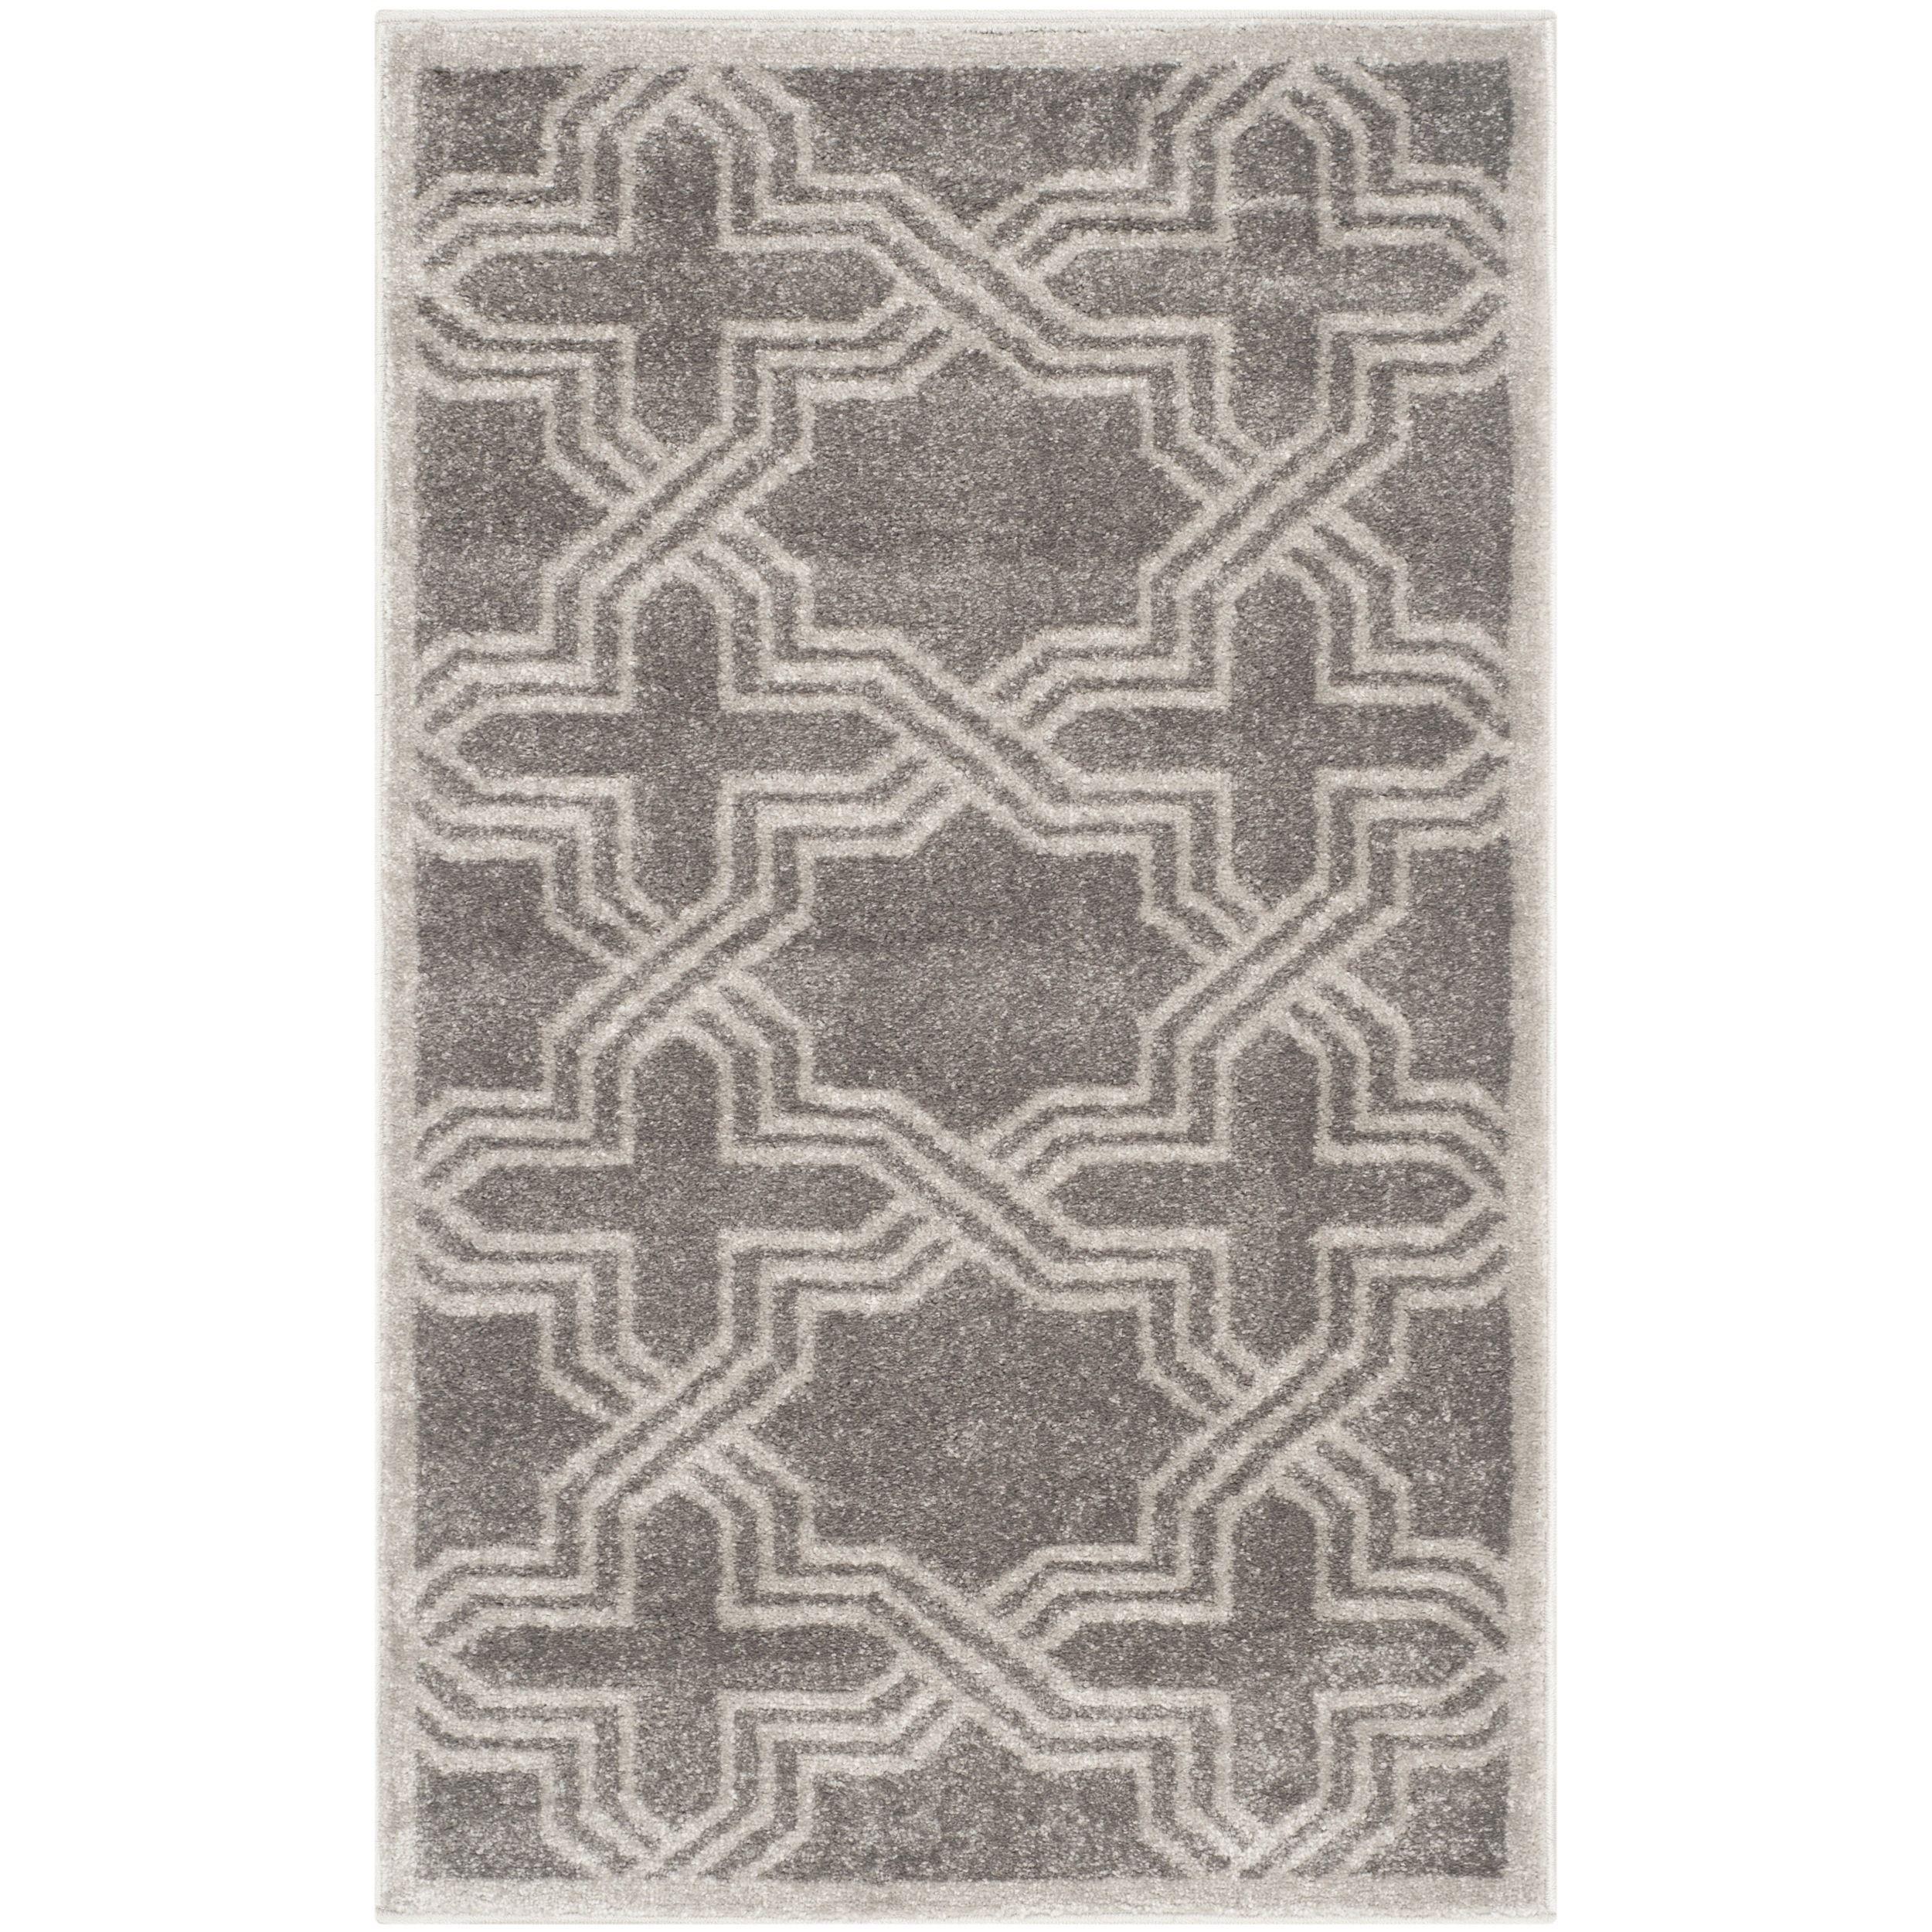 Safavieh Amherst Indoor/ Outdoor Grey/ Light Grey Rug (3' x 5') , Size 3' x 5' (Olefin, Geometric)